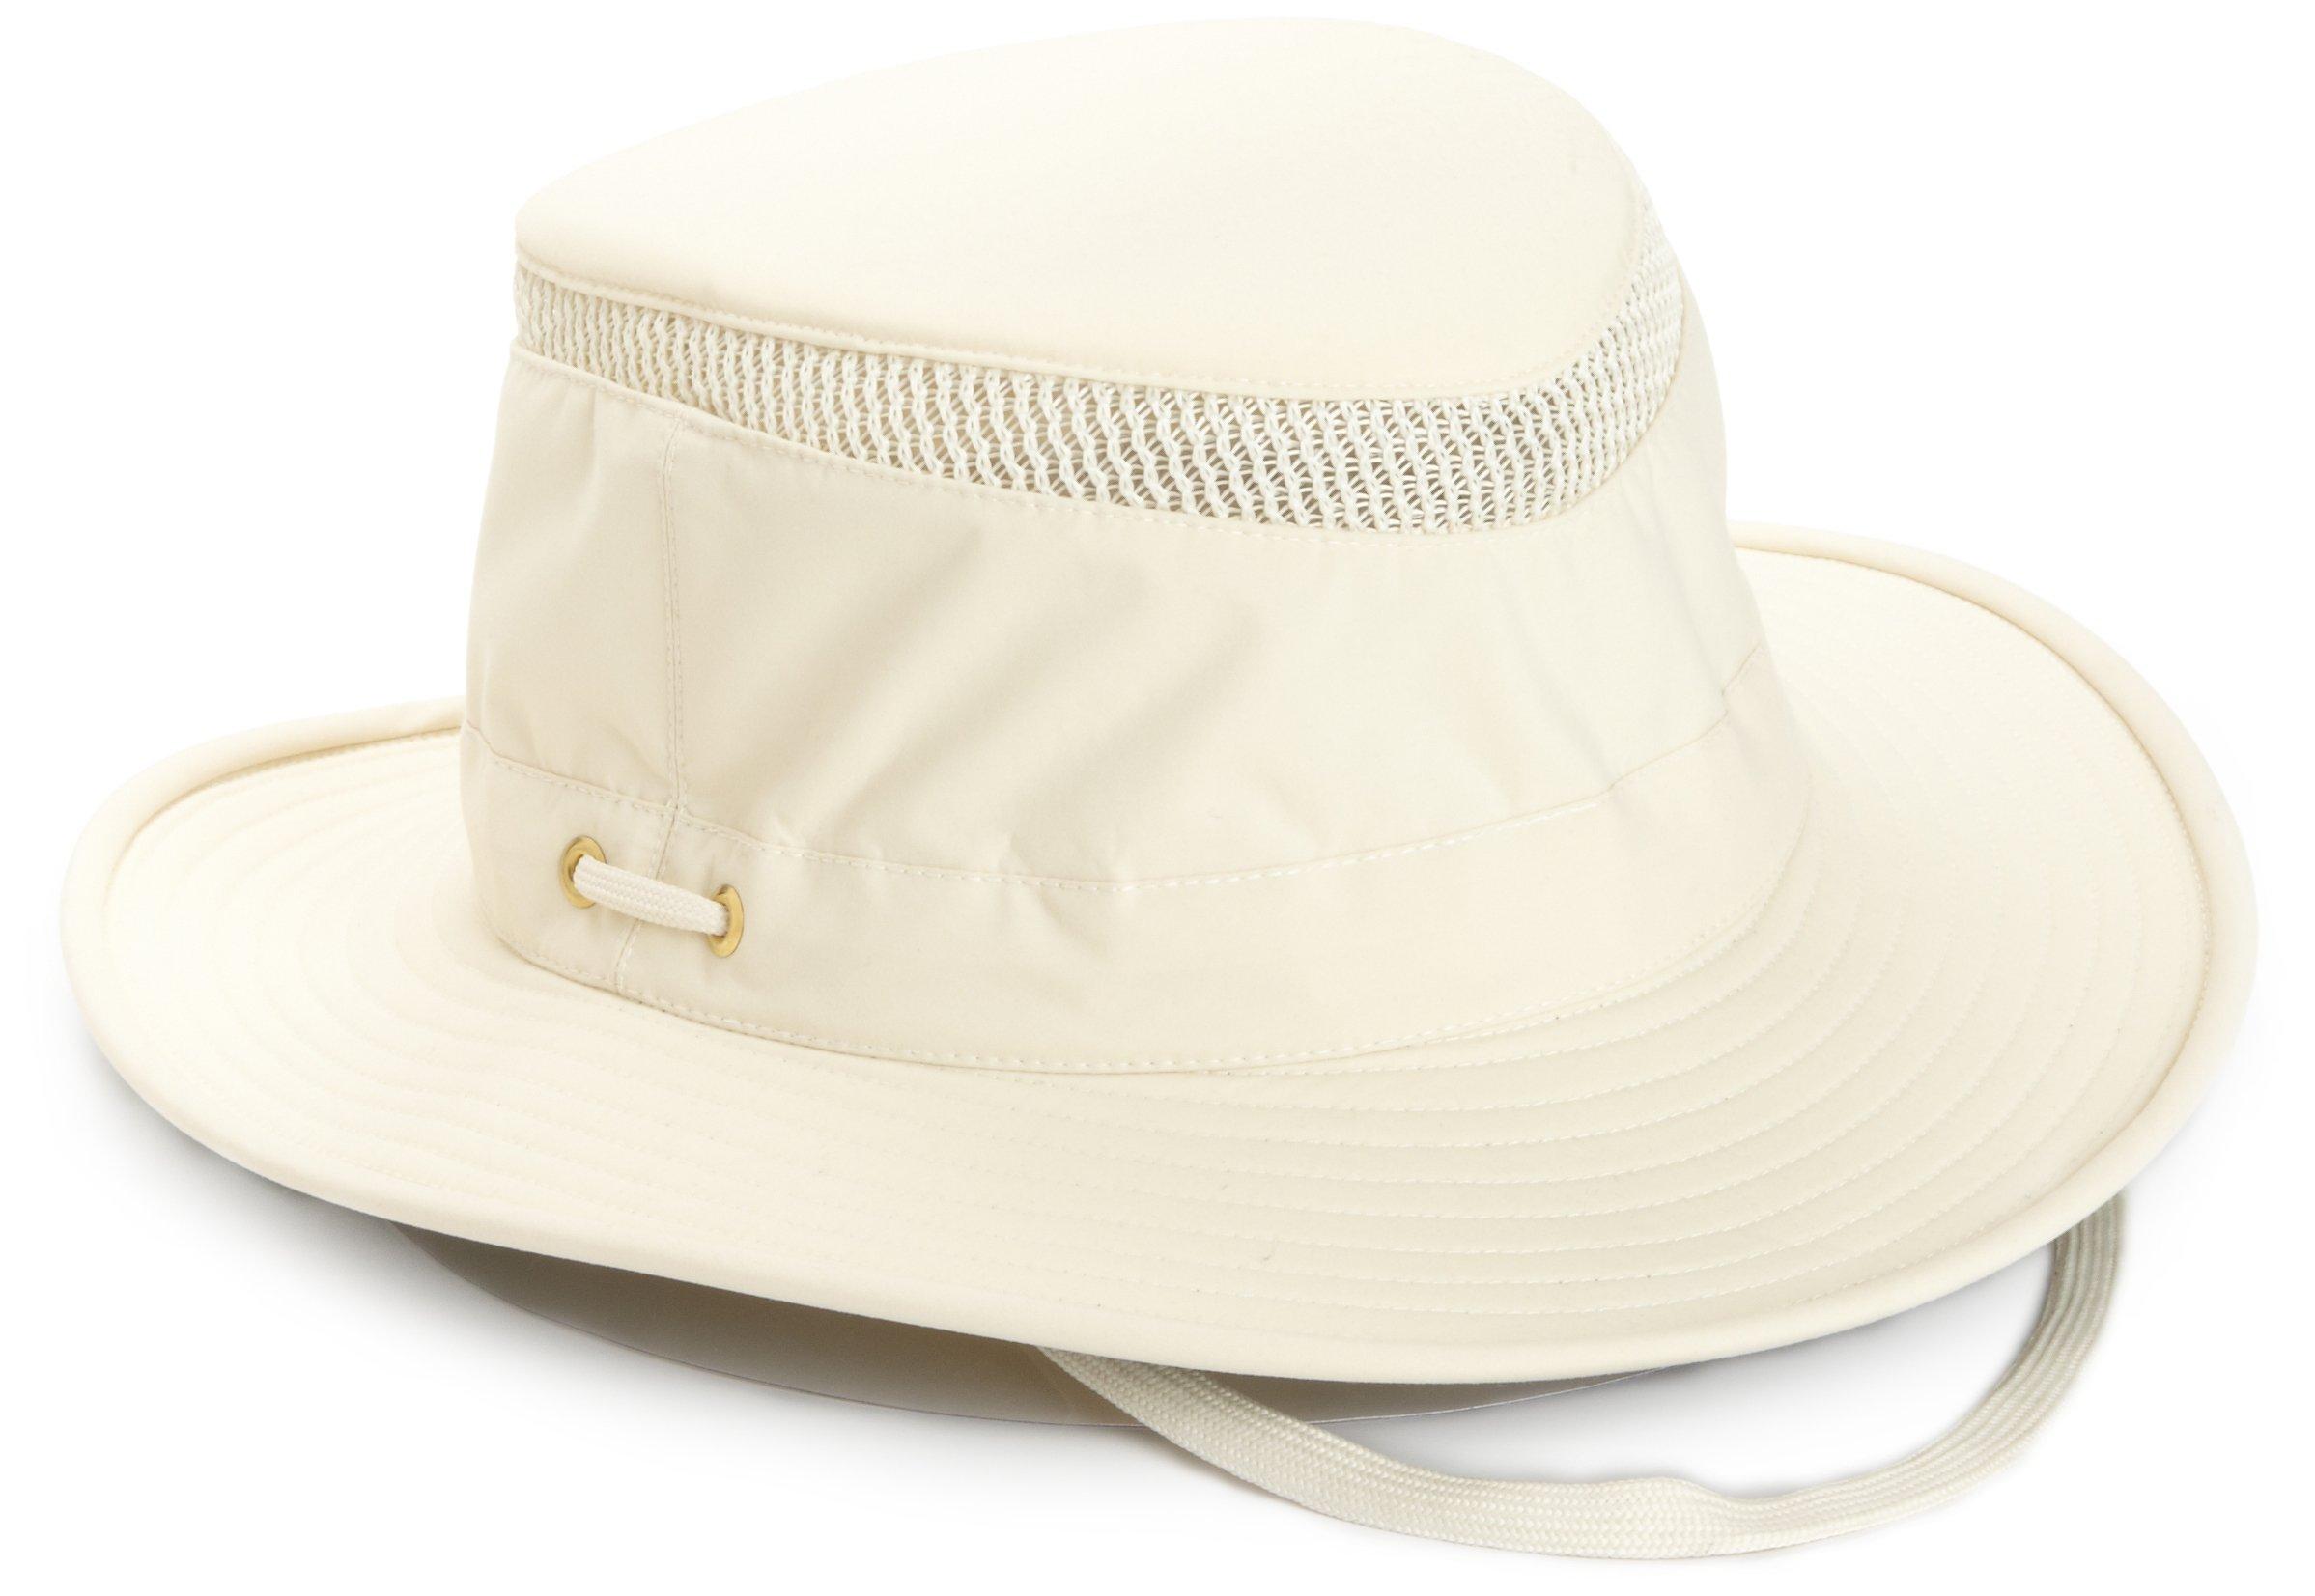 Tilley Endurables LTM5 Airflo Unisex Natural Green Hat, 7 3/4